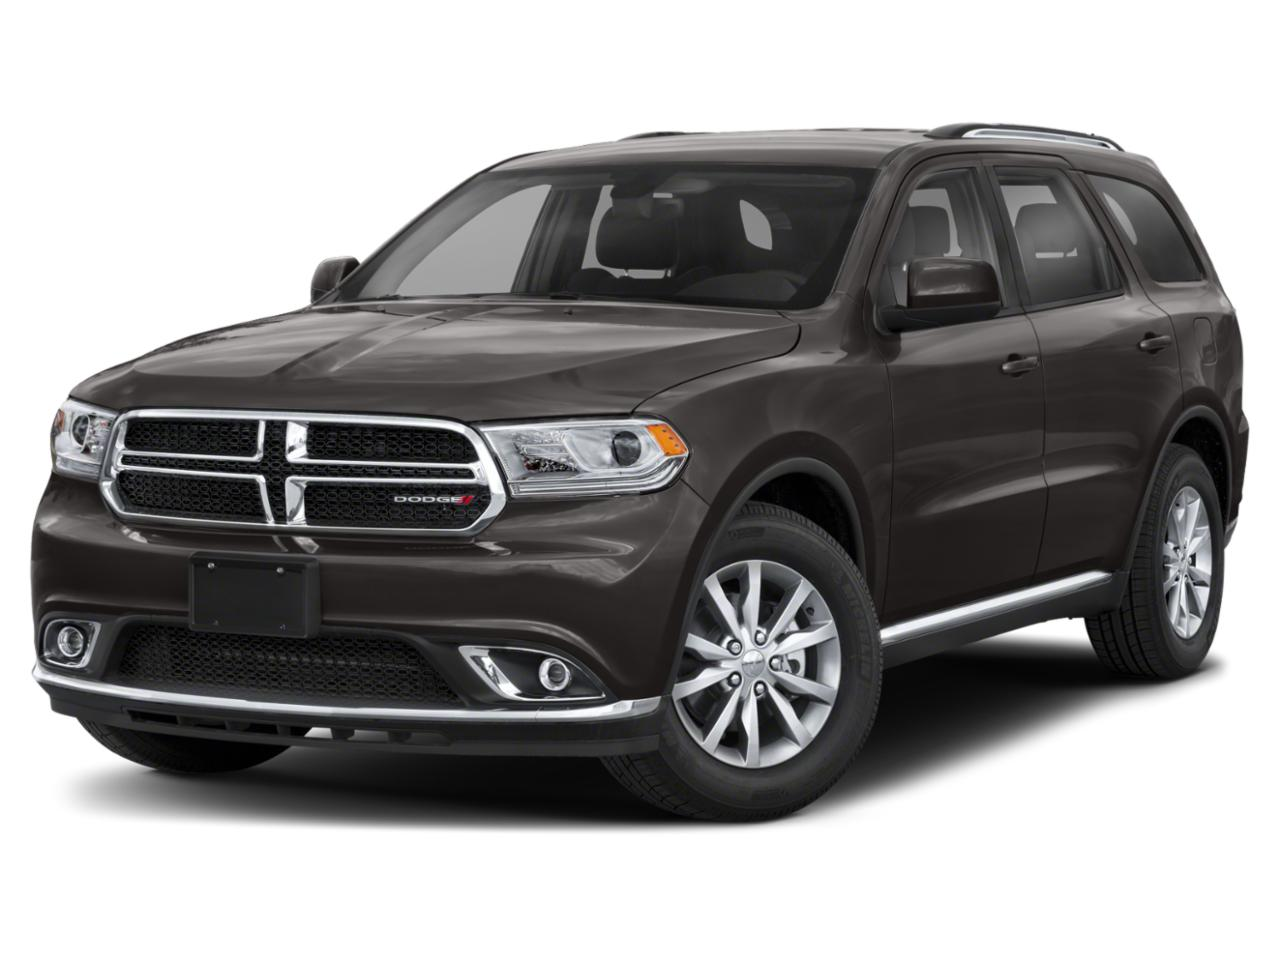 2018 Dodge Durango Vehicle Photo in San Antonio, TX 78254